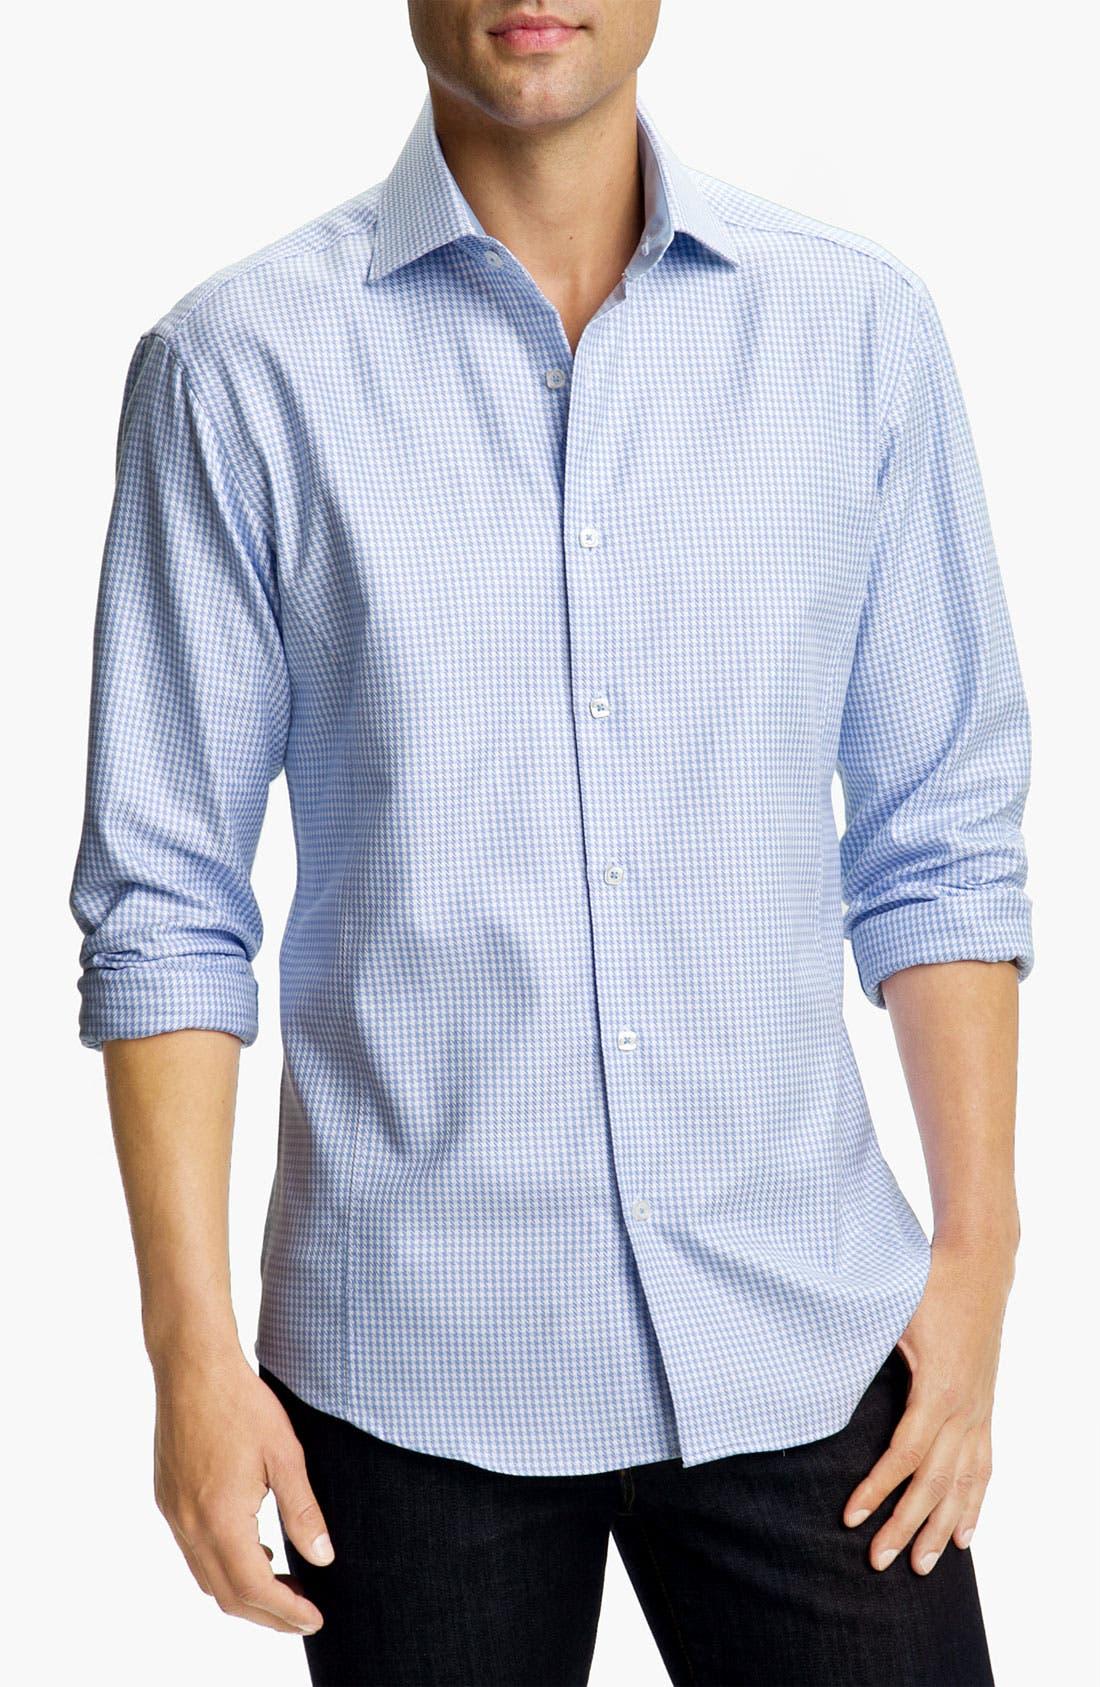 Main Image - Bugatchi Uomo Shaped Fit Sport Shirt